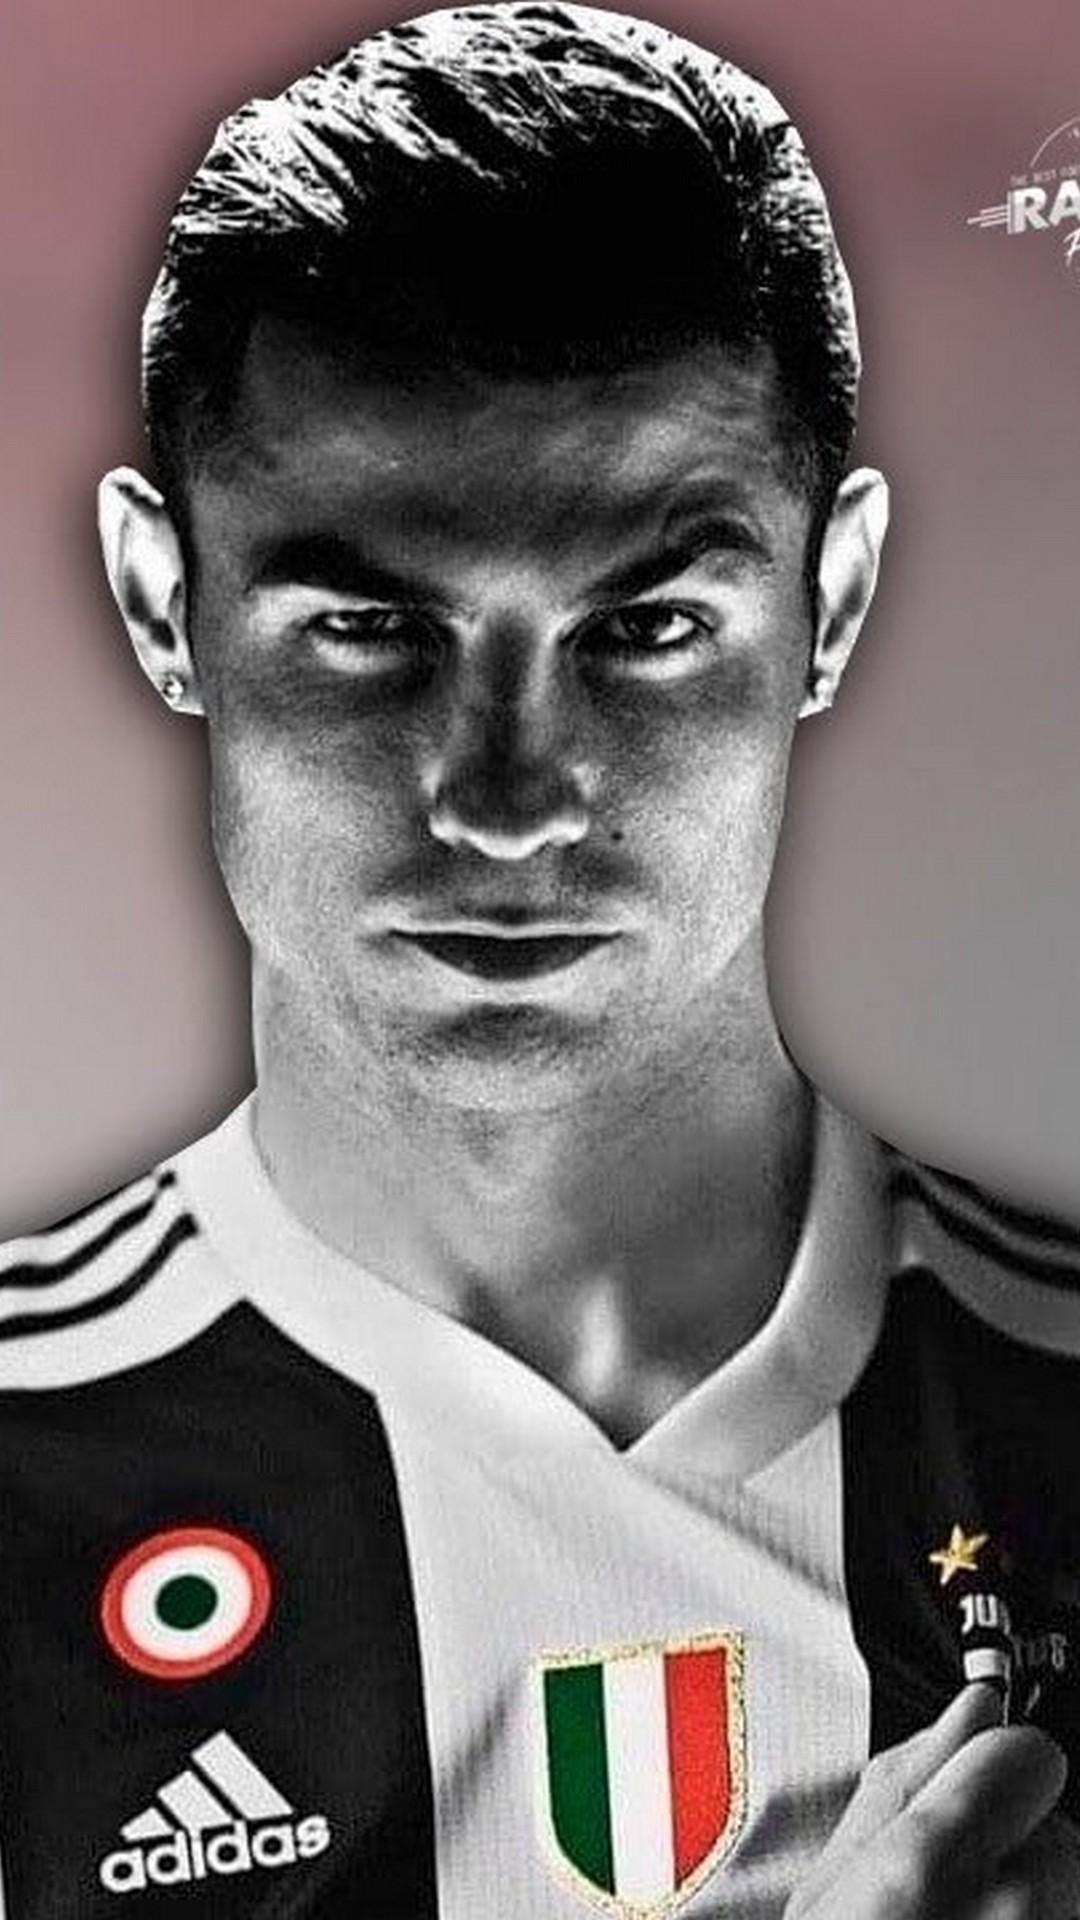 Wallpaper Cristiano Ronaldo Juventus iPhone 2020 3D iPhone Wallpaper 1080x1920